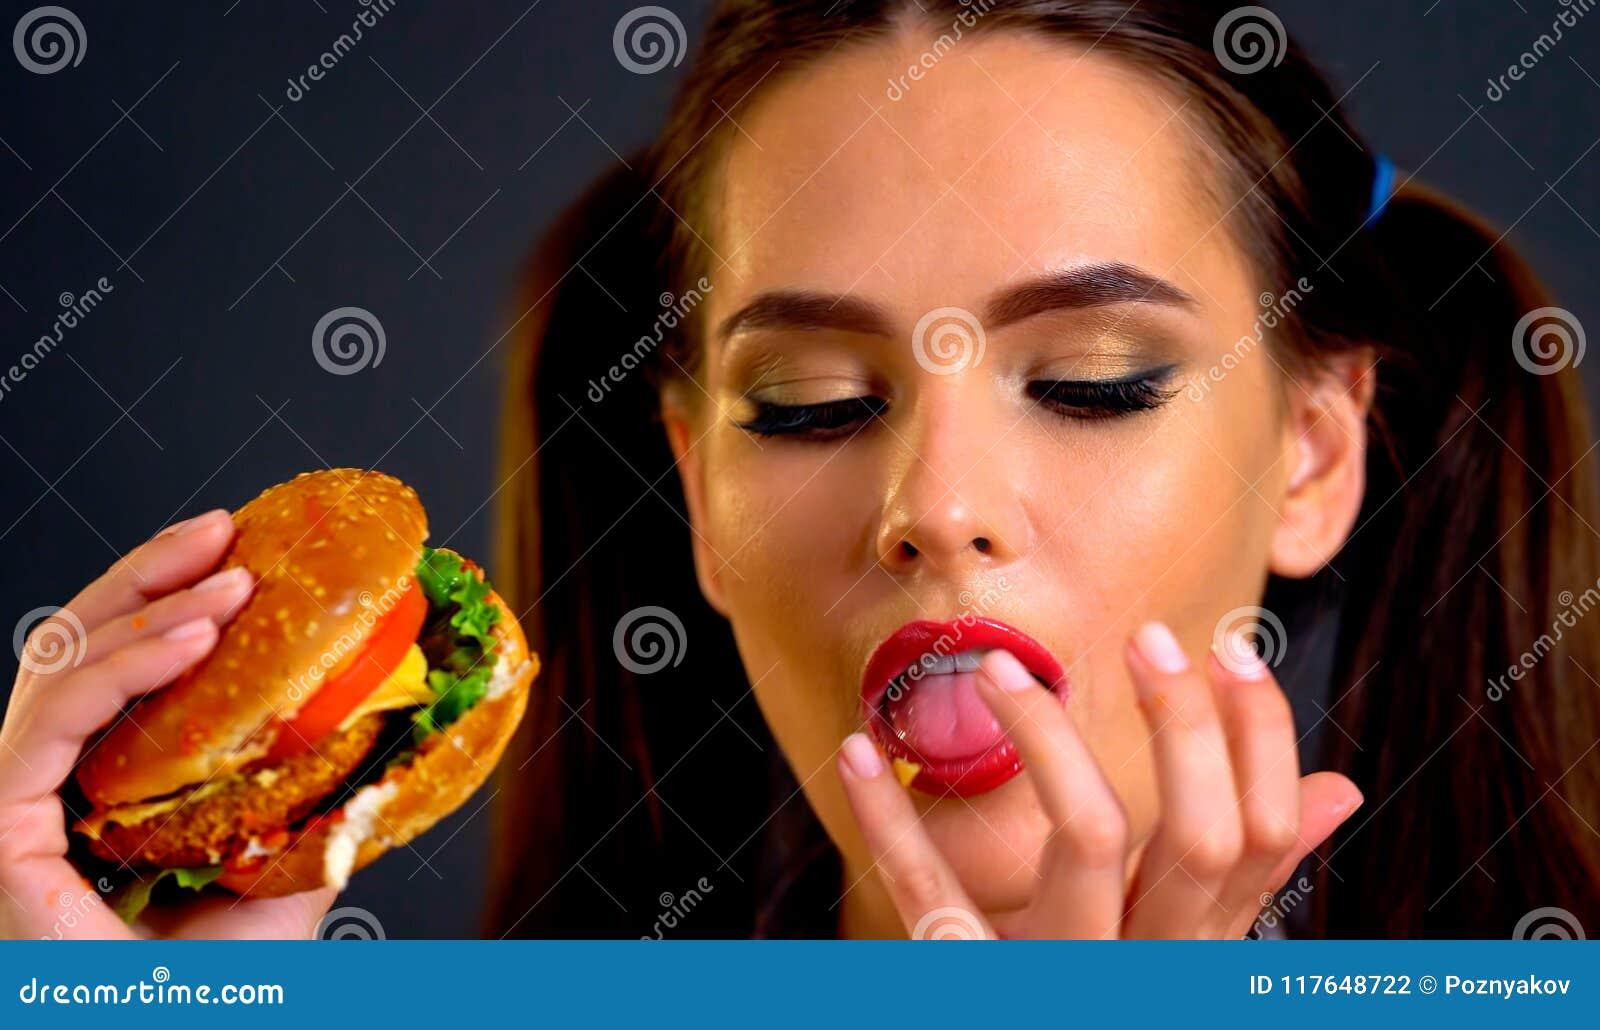 Woman eating hamburger. Girl wants to eat fast food.